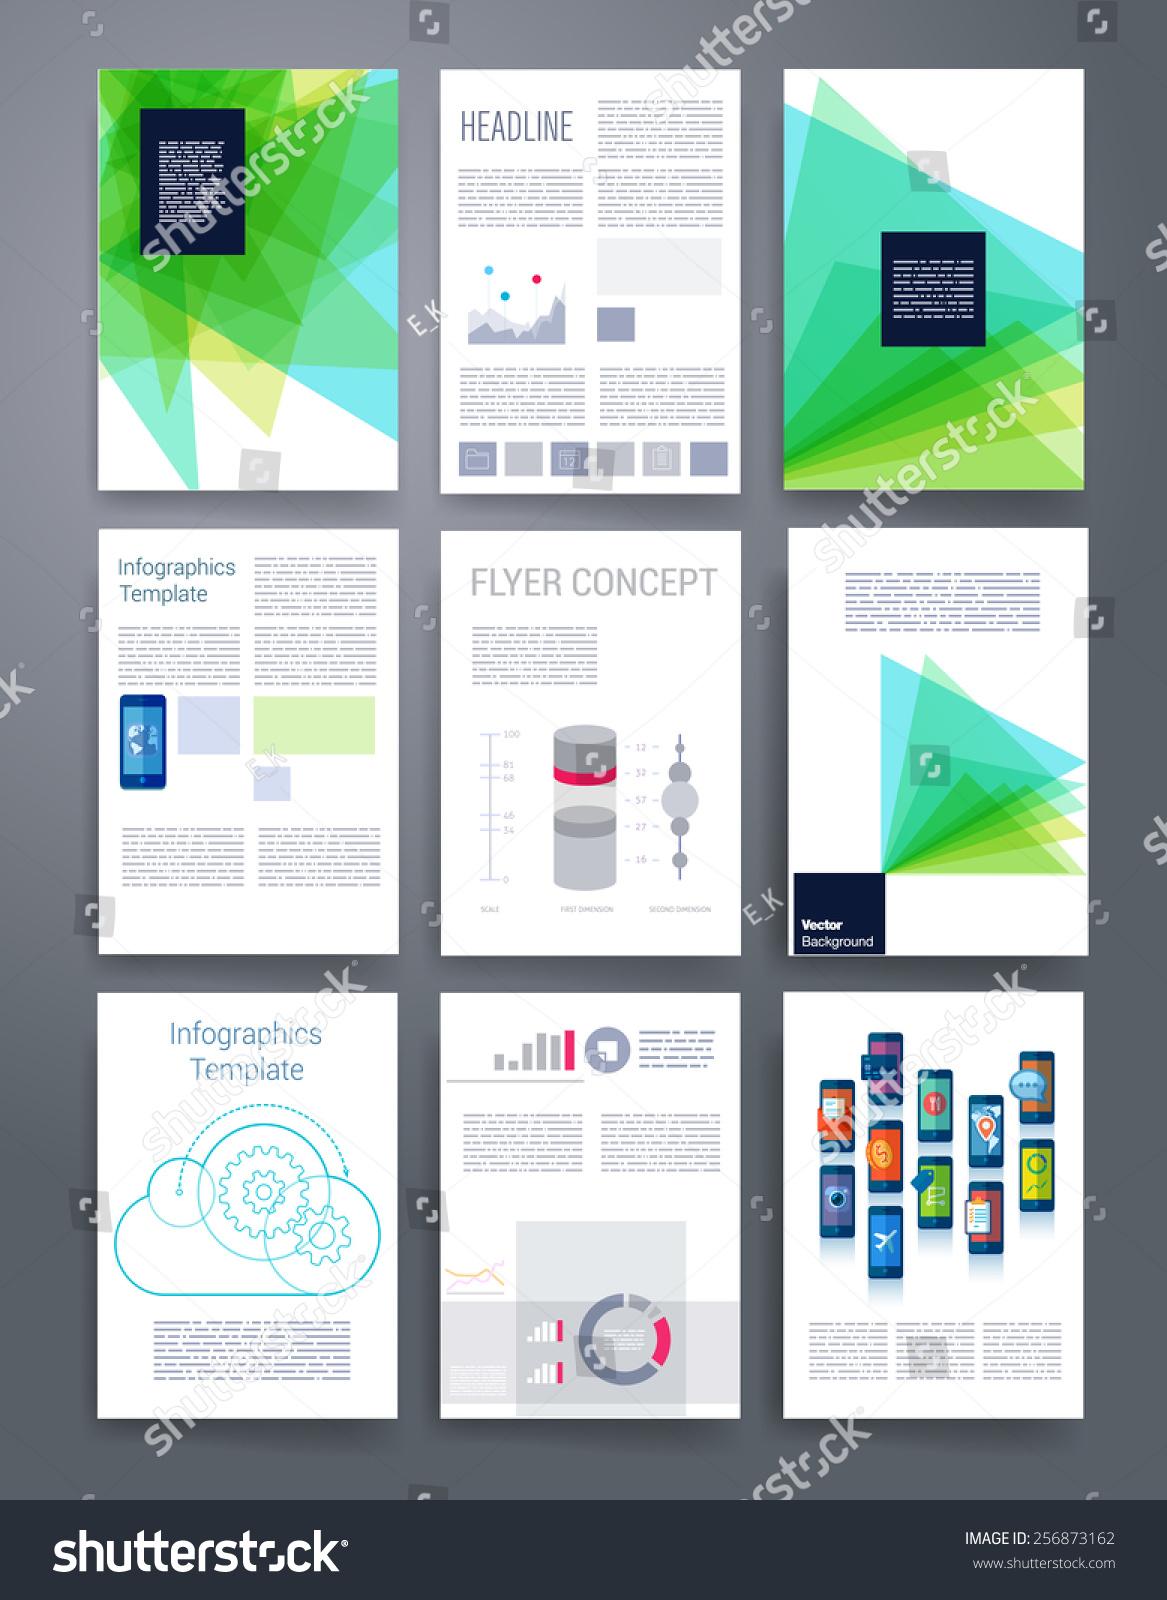 templates vector flyer brochure magazine cover template can use templates vector flyer brochure magazine cover template can use for print and marketing